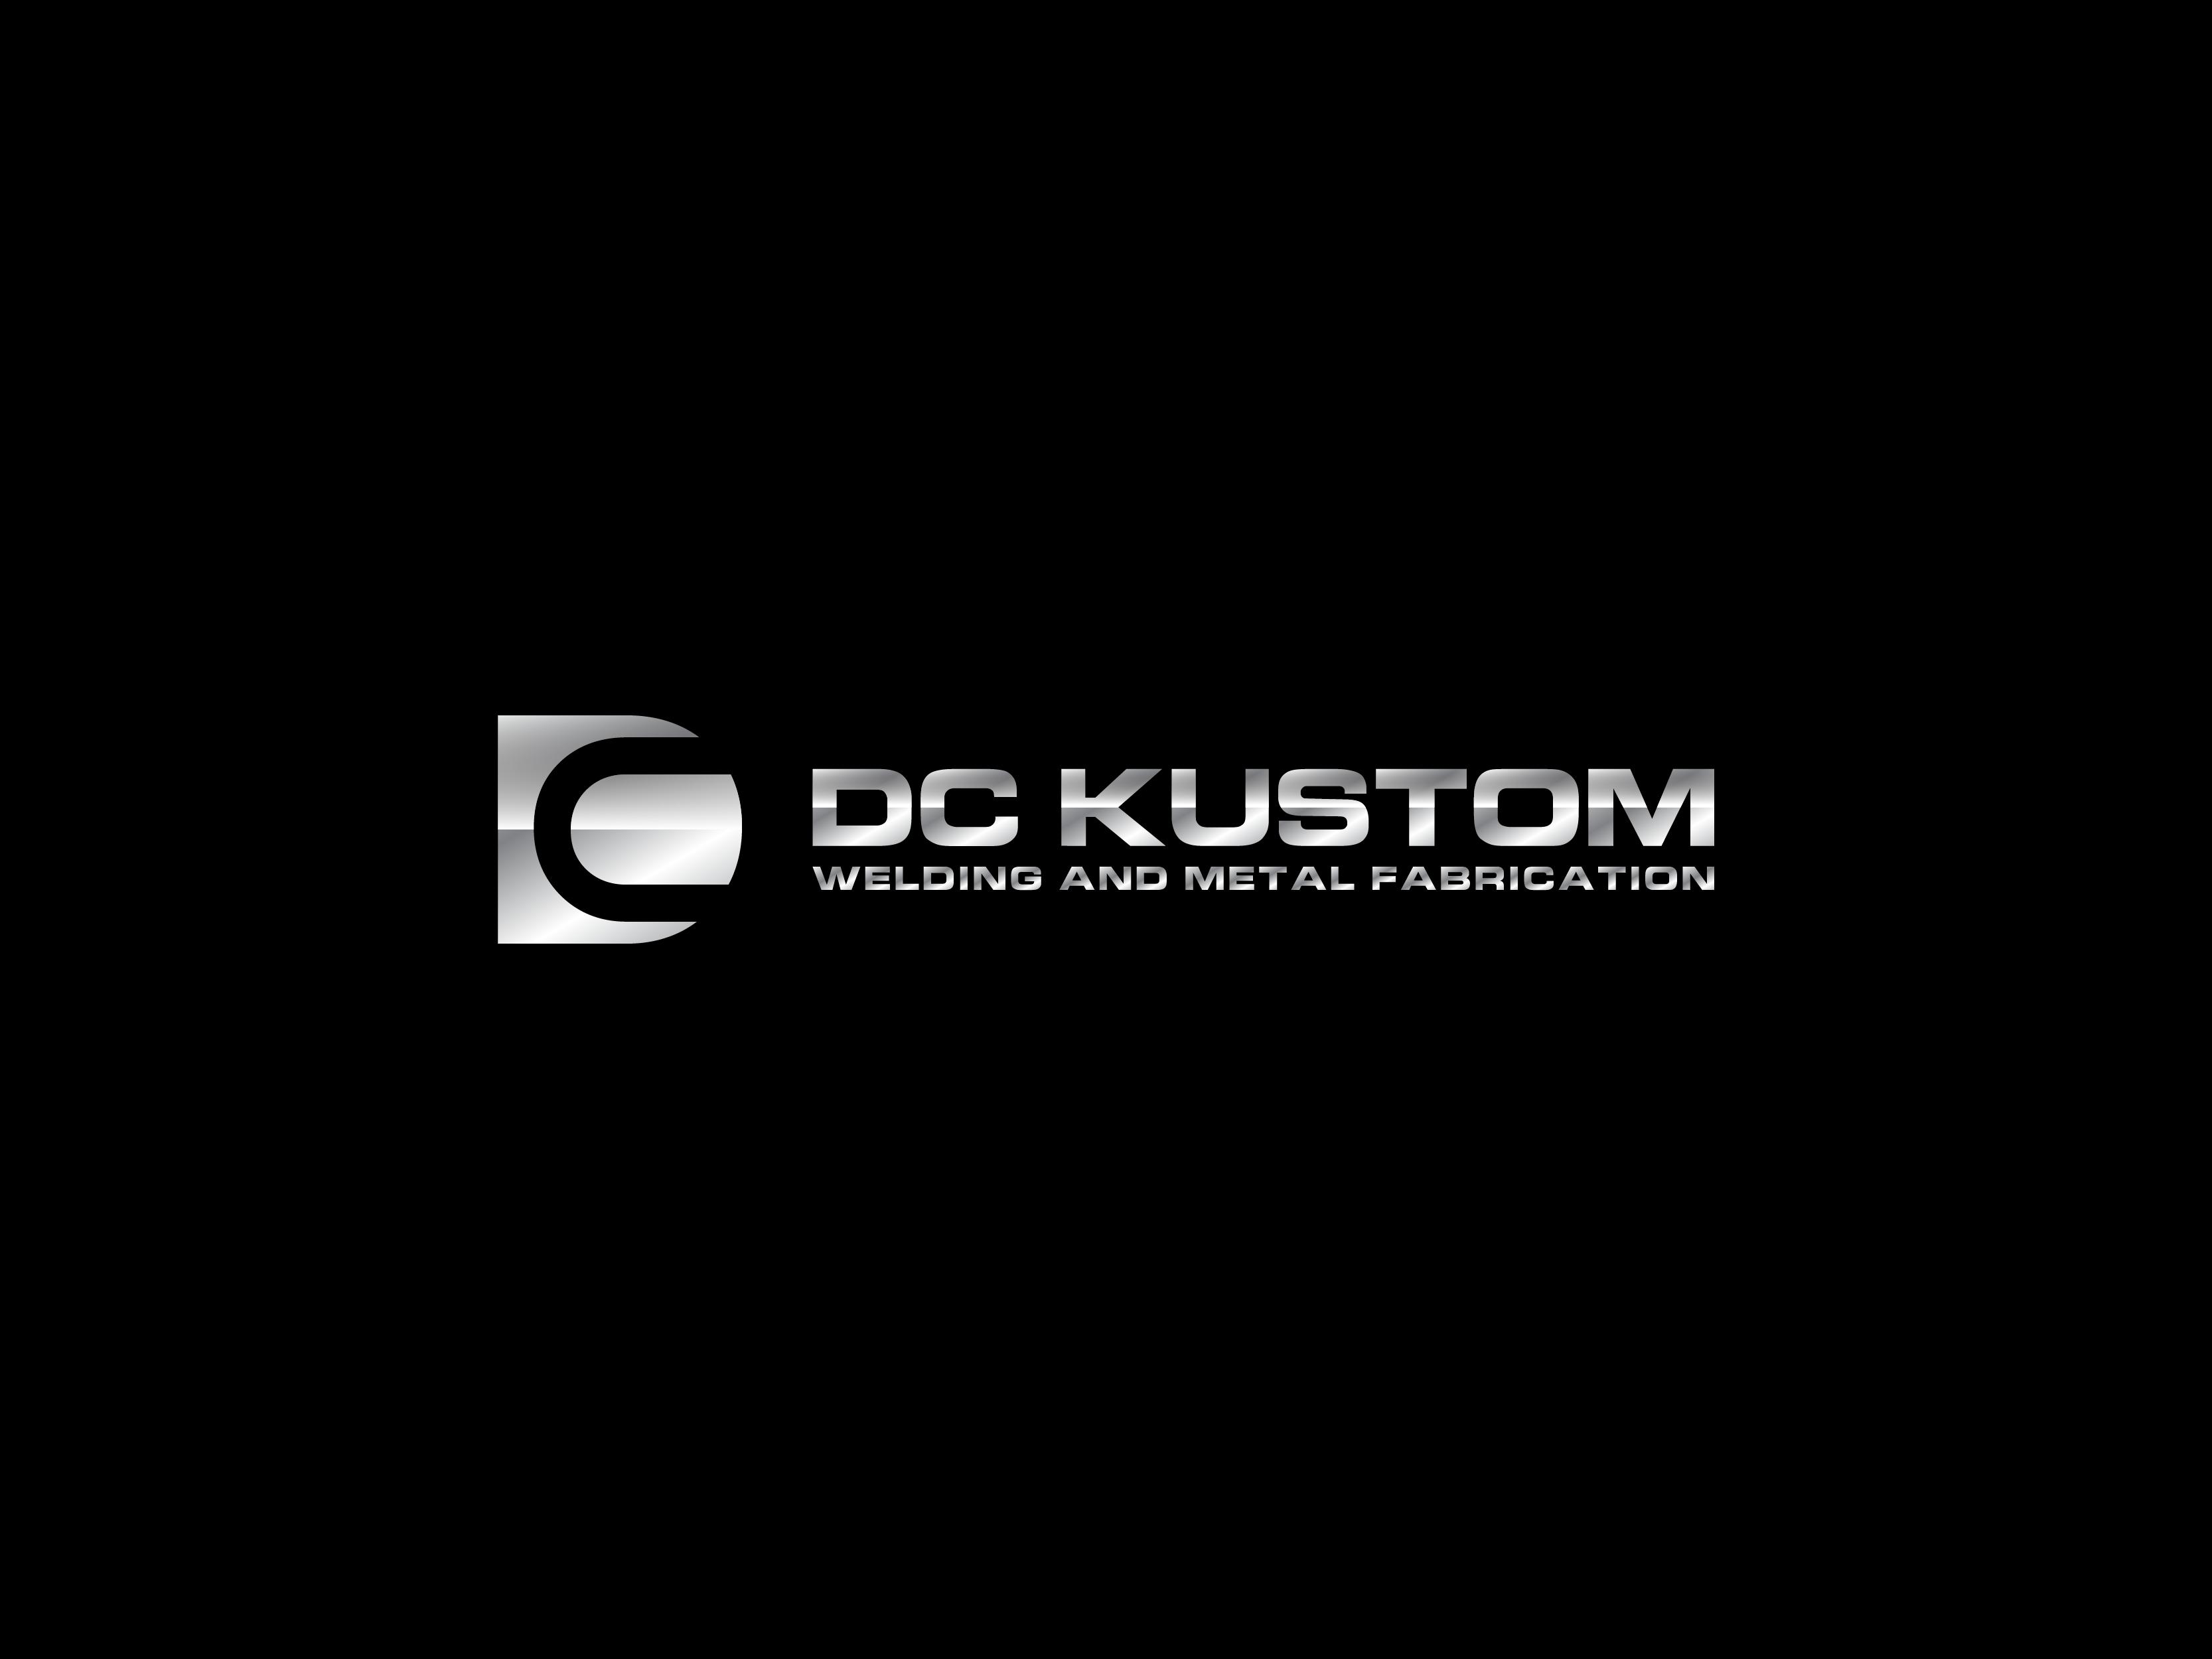 Logo Design by Shivaprasad Sangondimath - Entry No. 137 in the Logo Design Contest Imaginative Logo Design for DC KUSTOM WELDING & METAL FABRICATION.